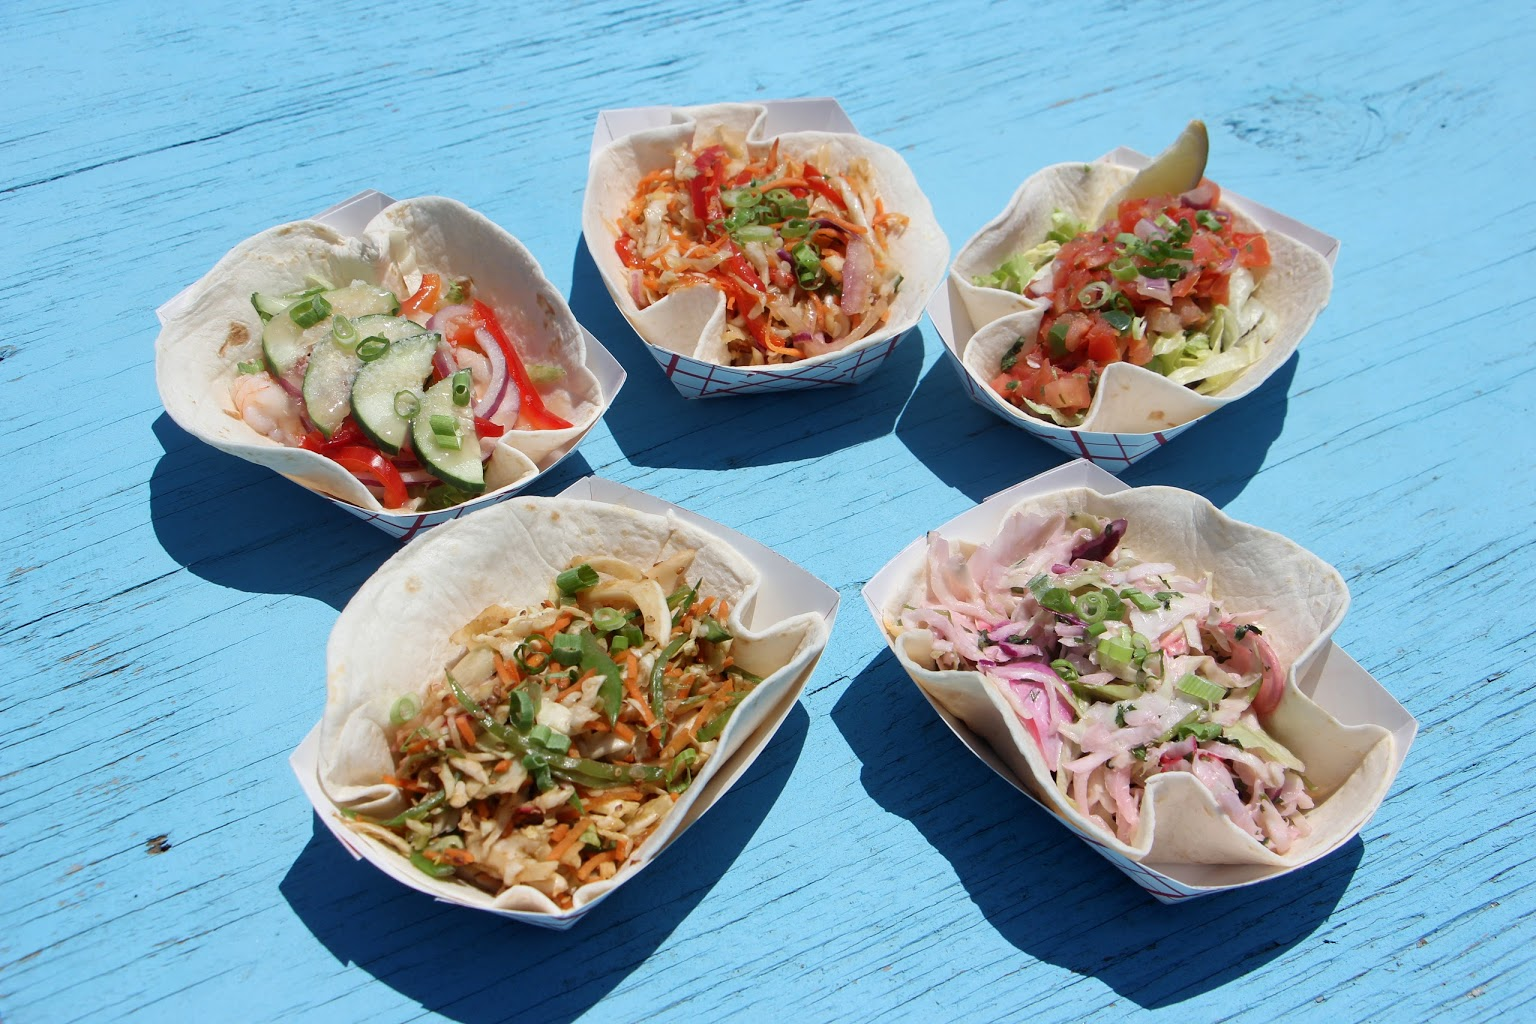 5 tacos in star pattern MOGO Korean Fusion Tacos - See-Inside Taco Stand, Asbury Park, NJ